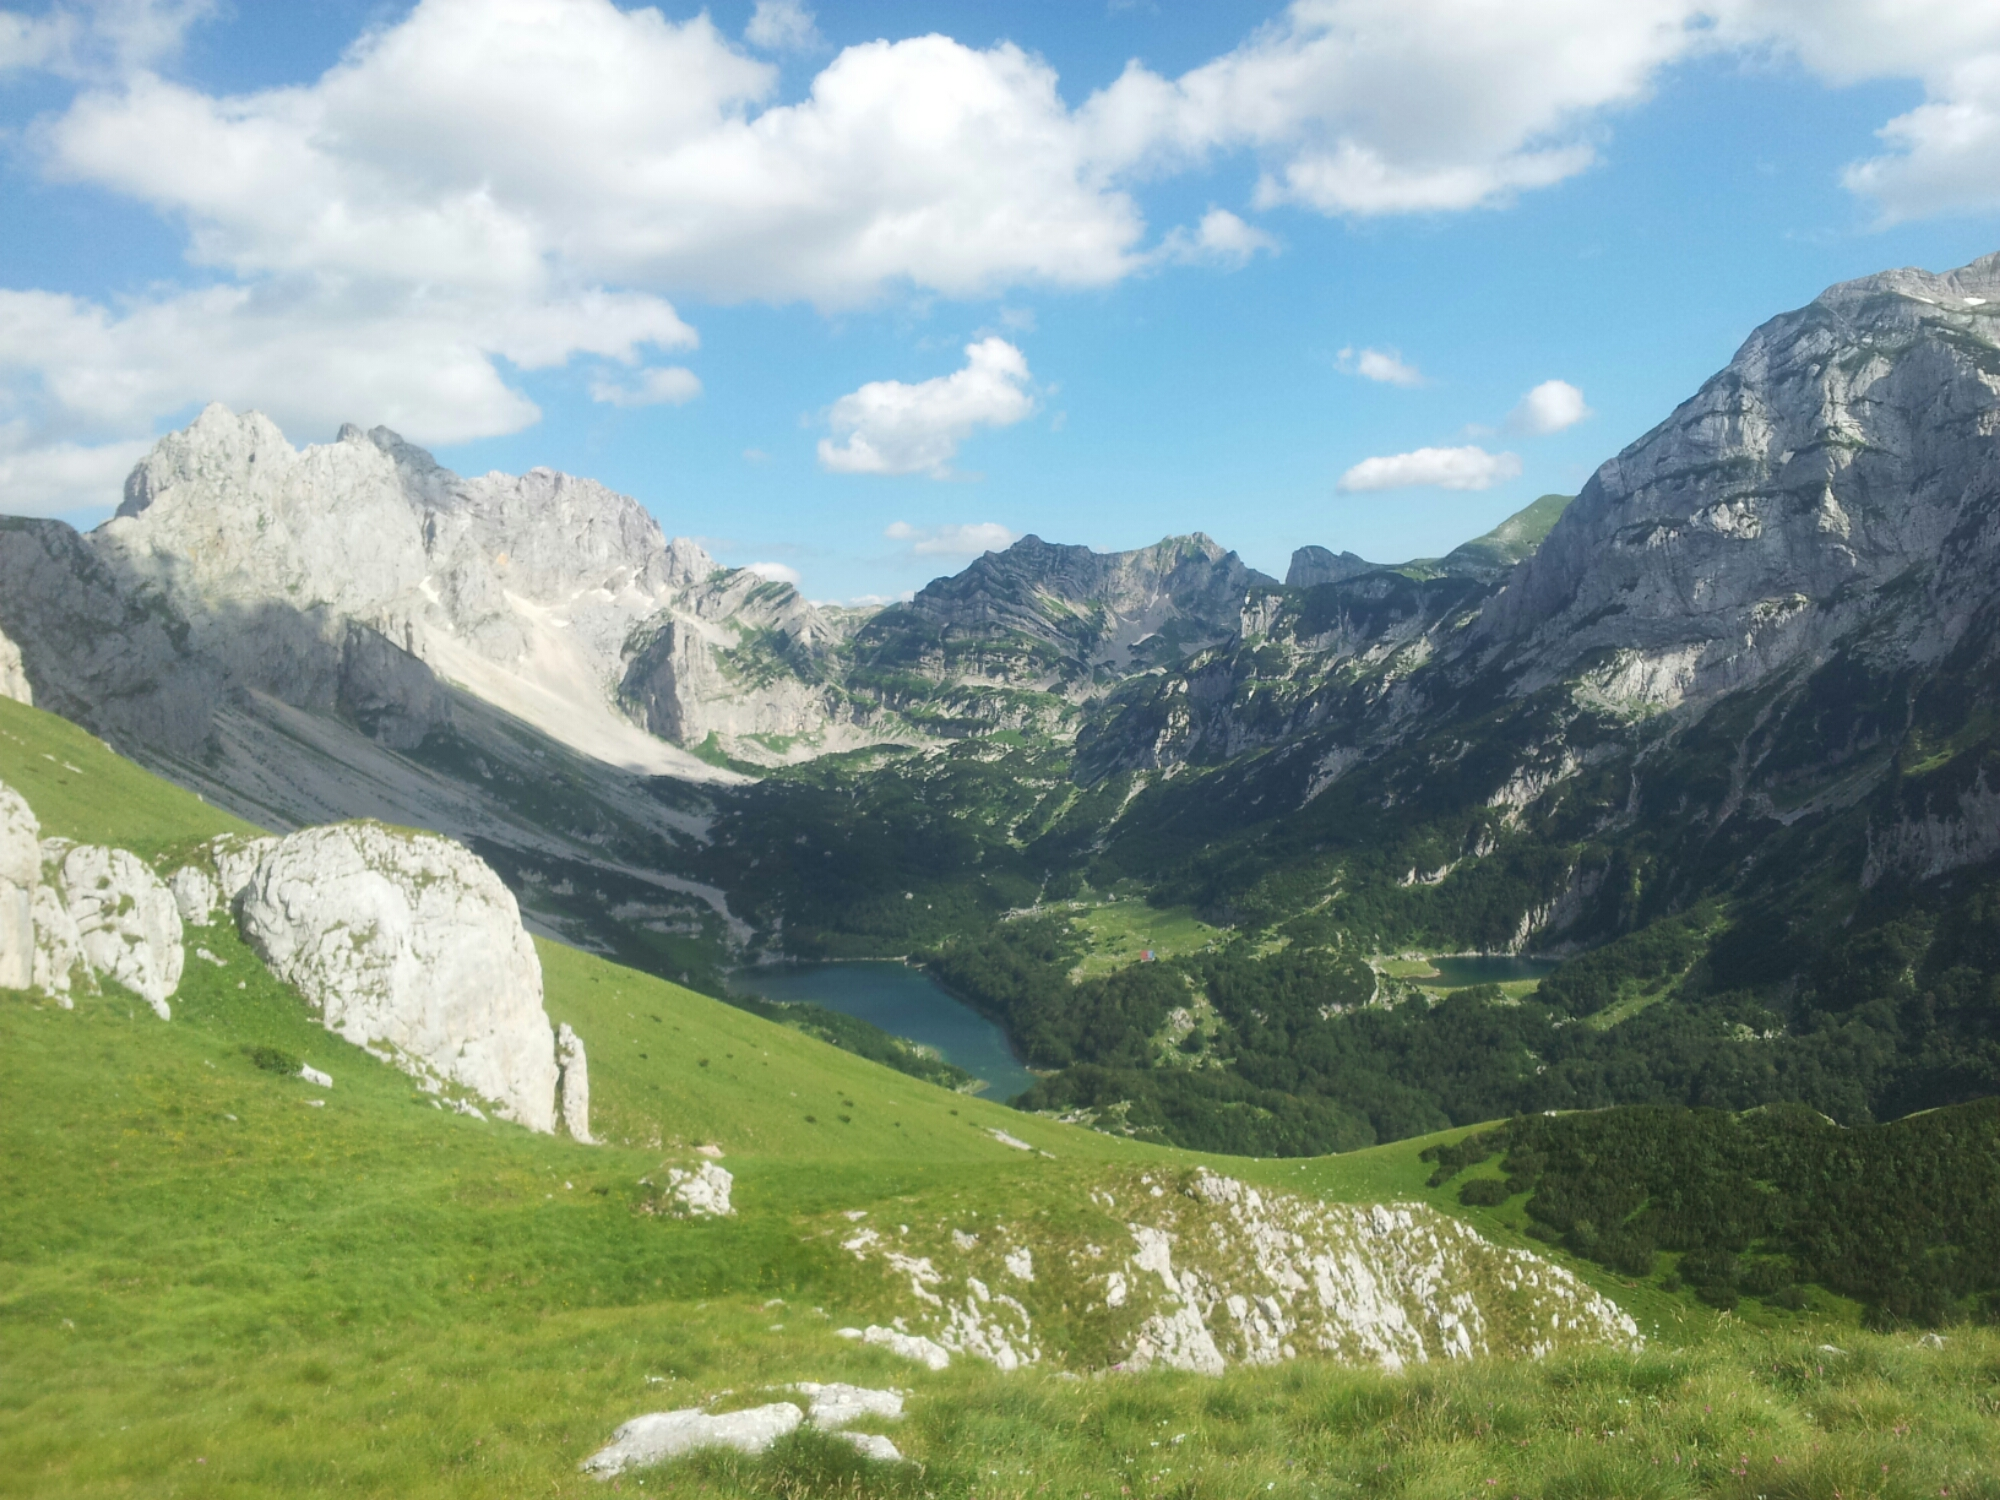 Škrčko jezero Durmitor | Bobotov Kuk, to climb or not to climb? | Via Dinarica White Trail MONTENEGRO